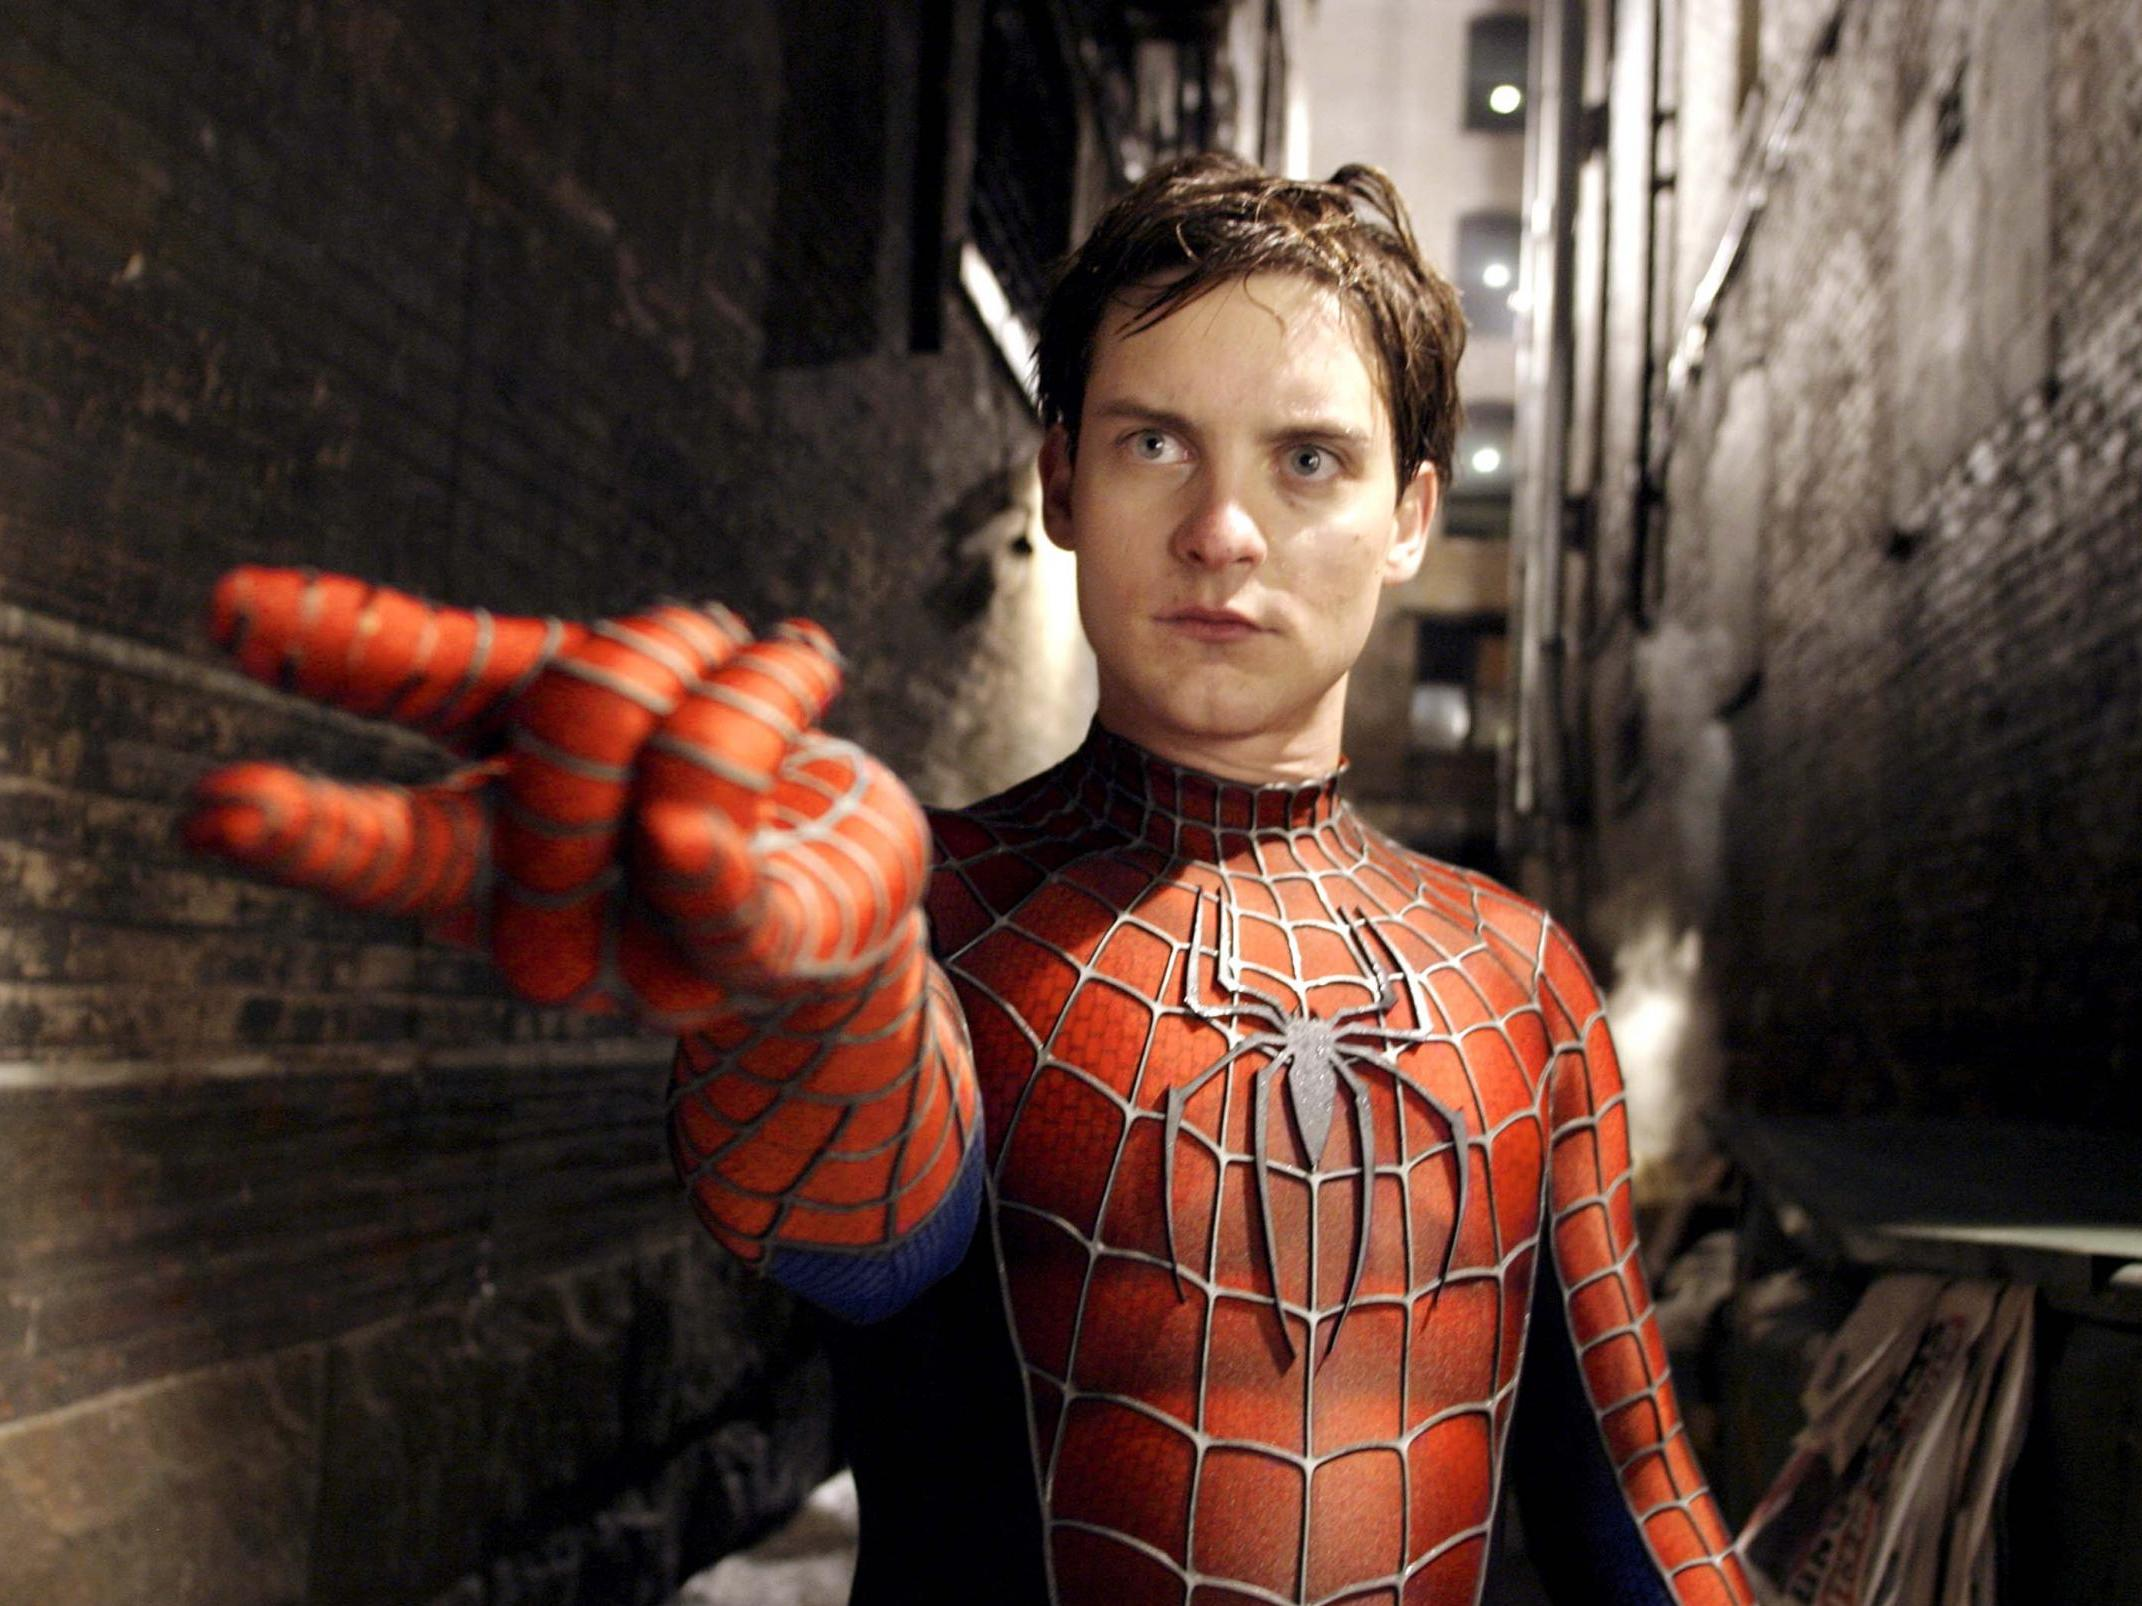 Examining Superhero Films Pre-The Avengers (2012)